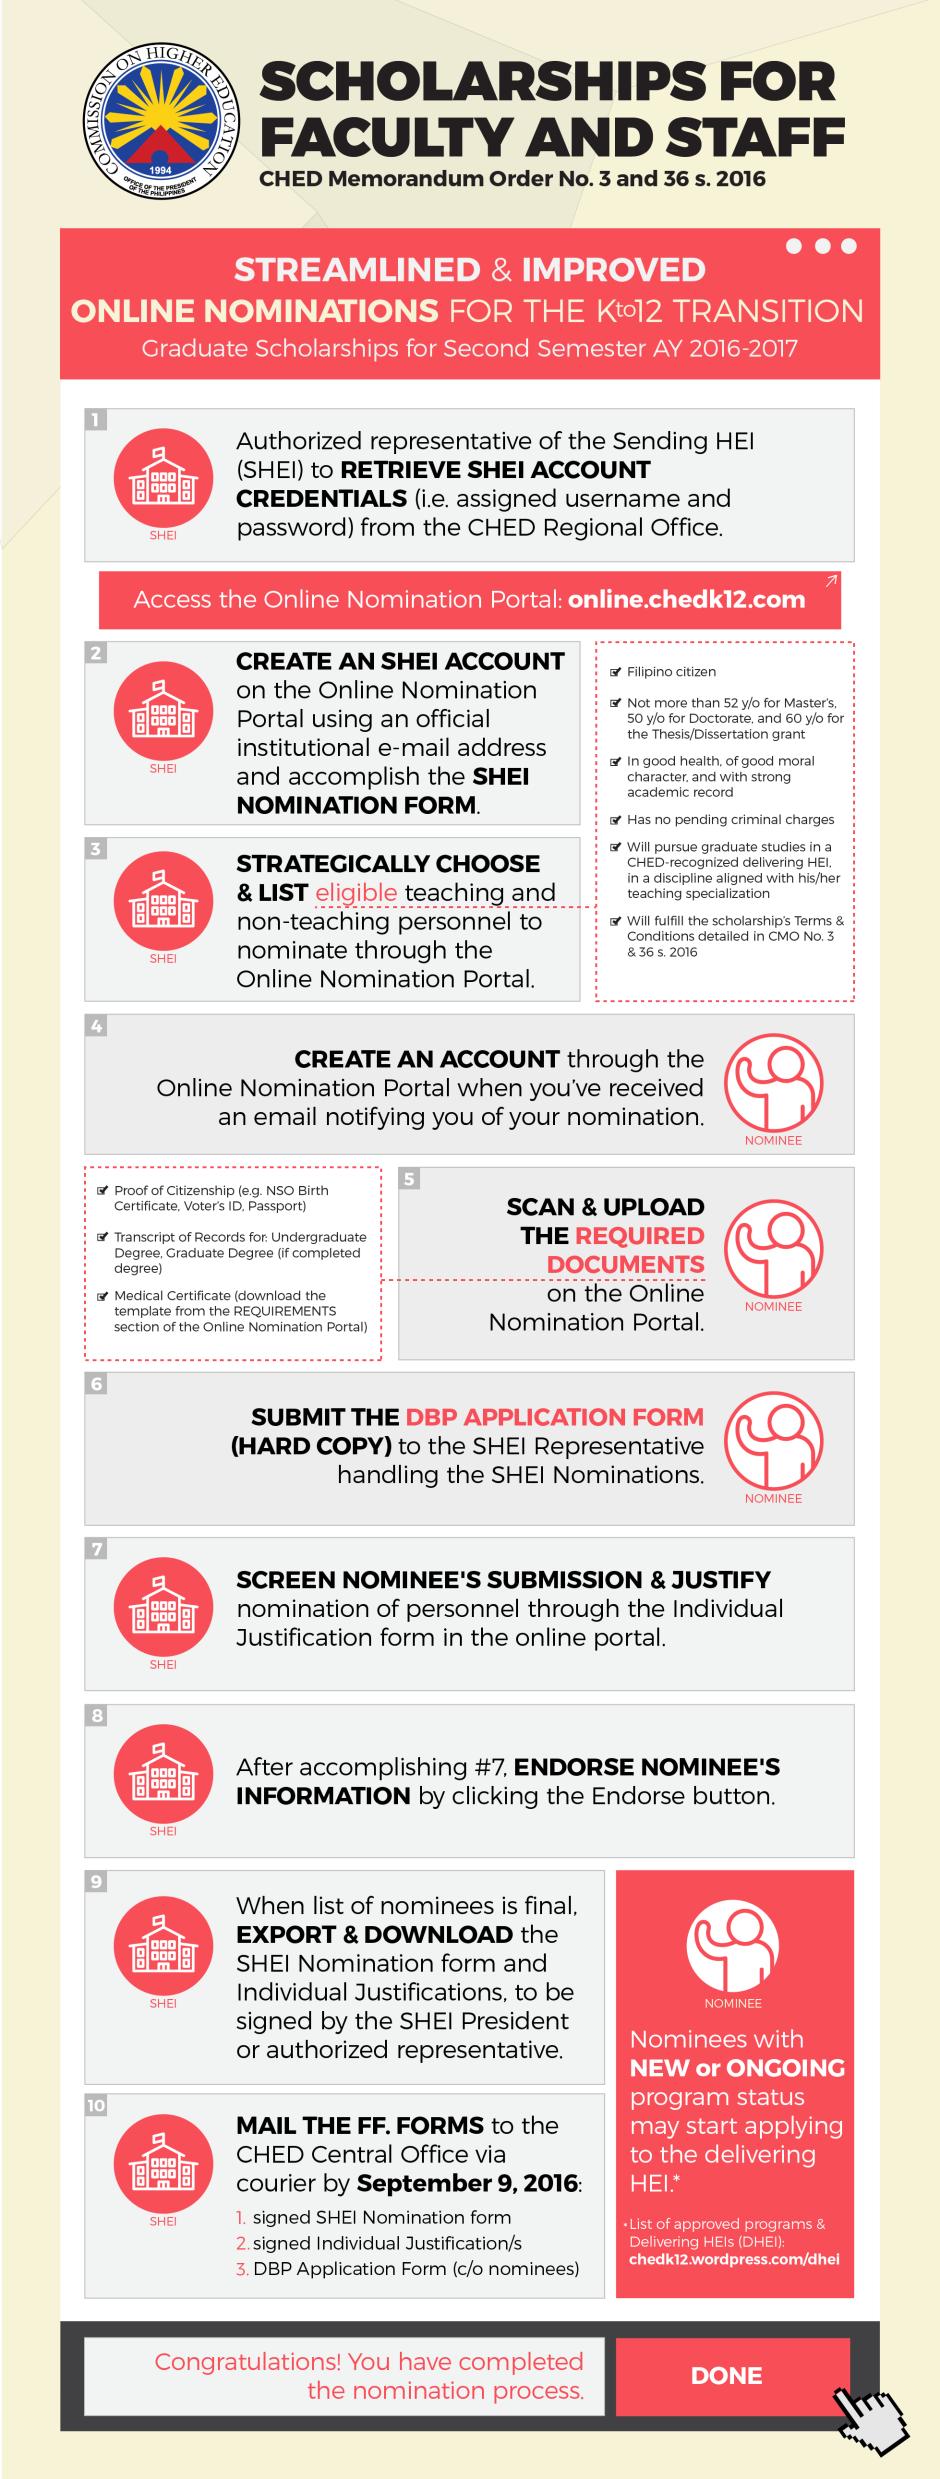 SGS_NominationProcessWebsite_v10-07